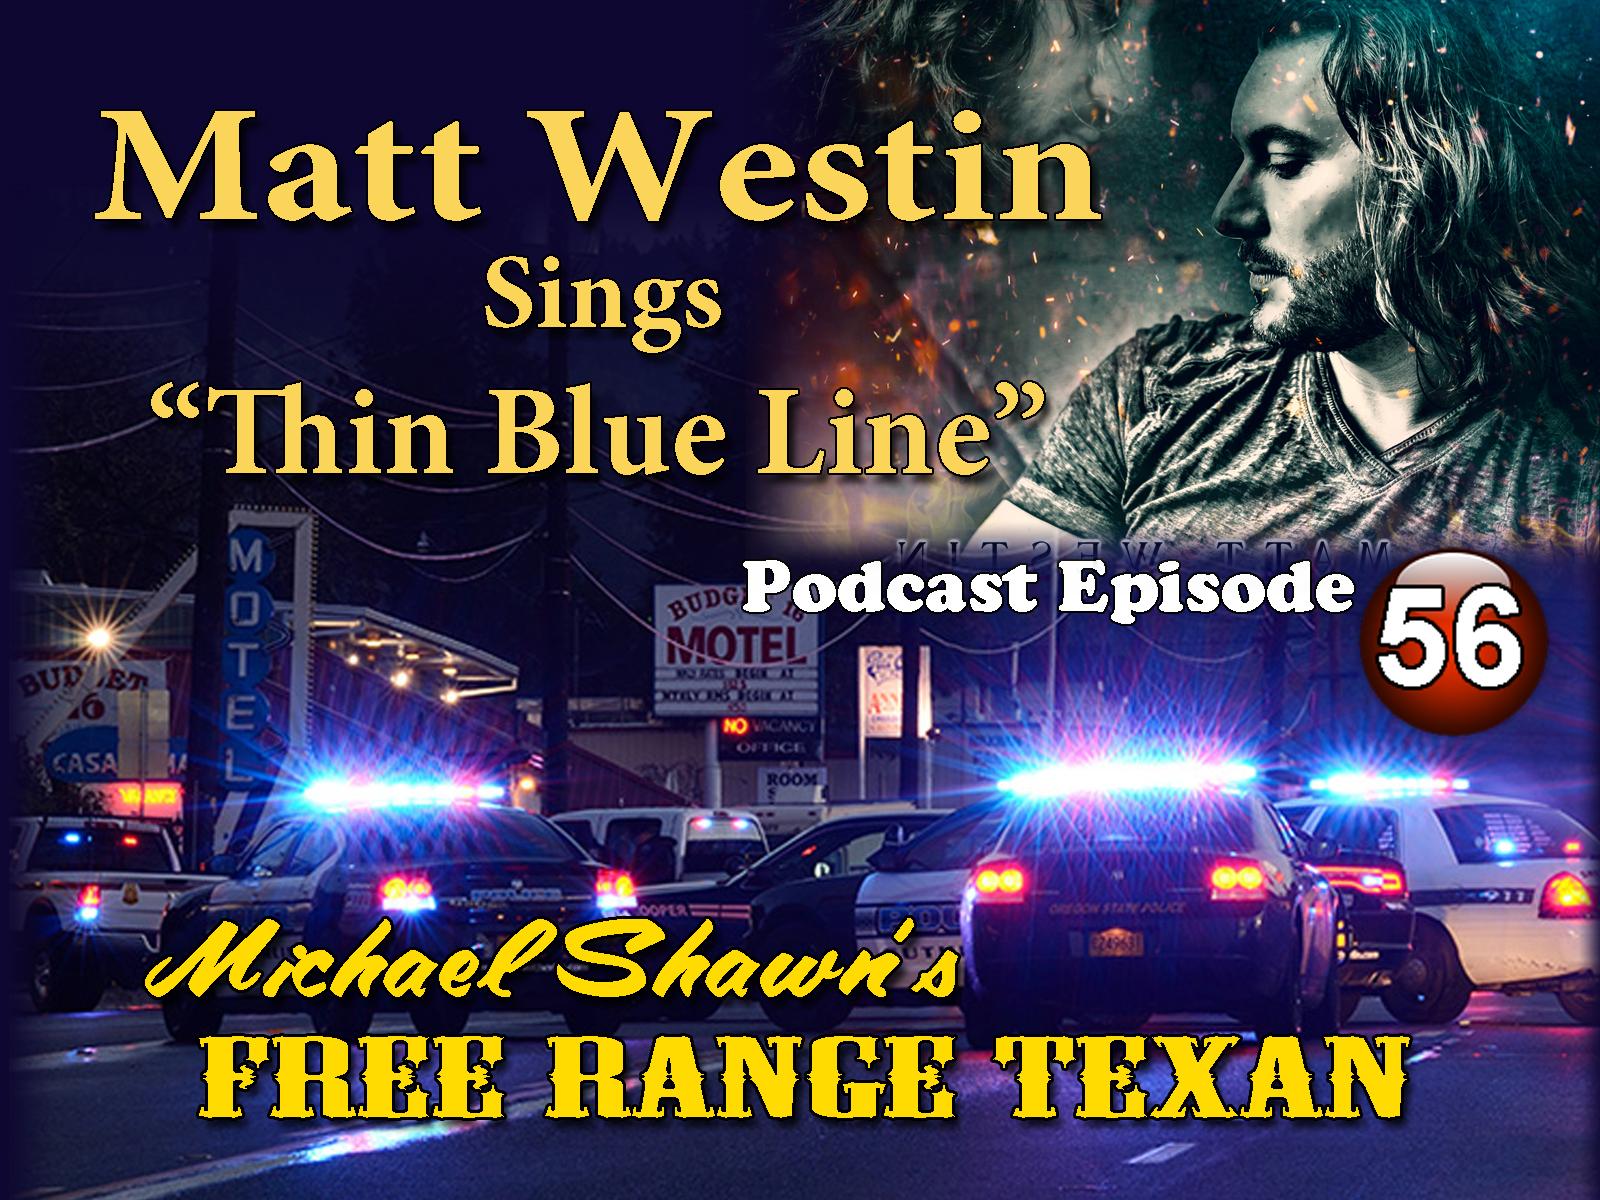 Free Range Texan Podcast Episode 56